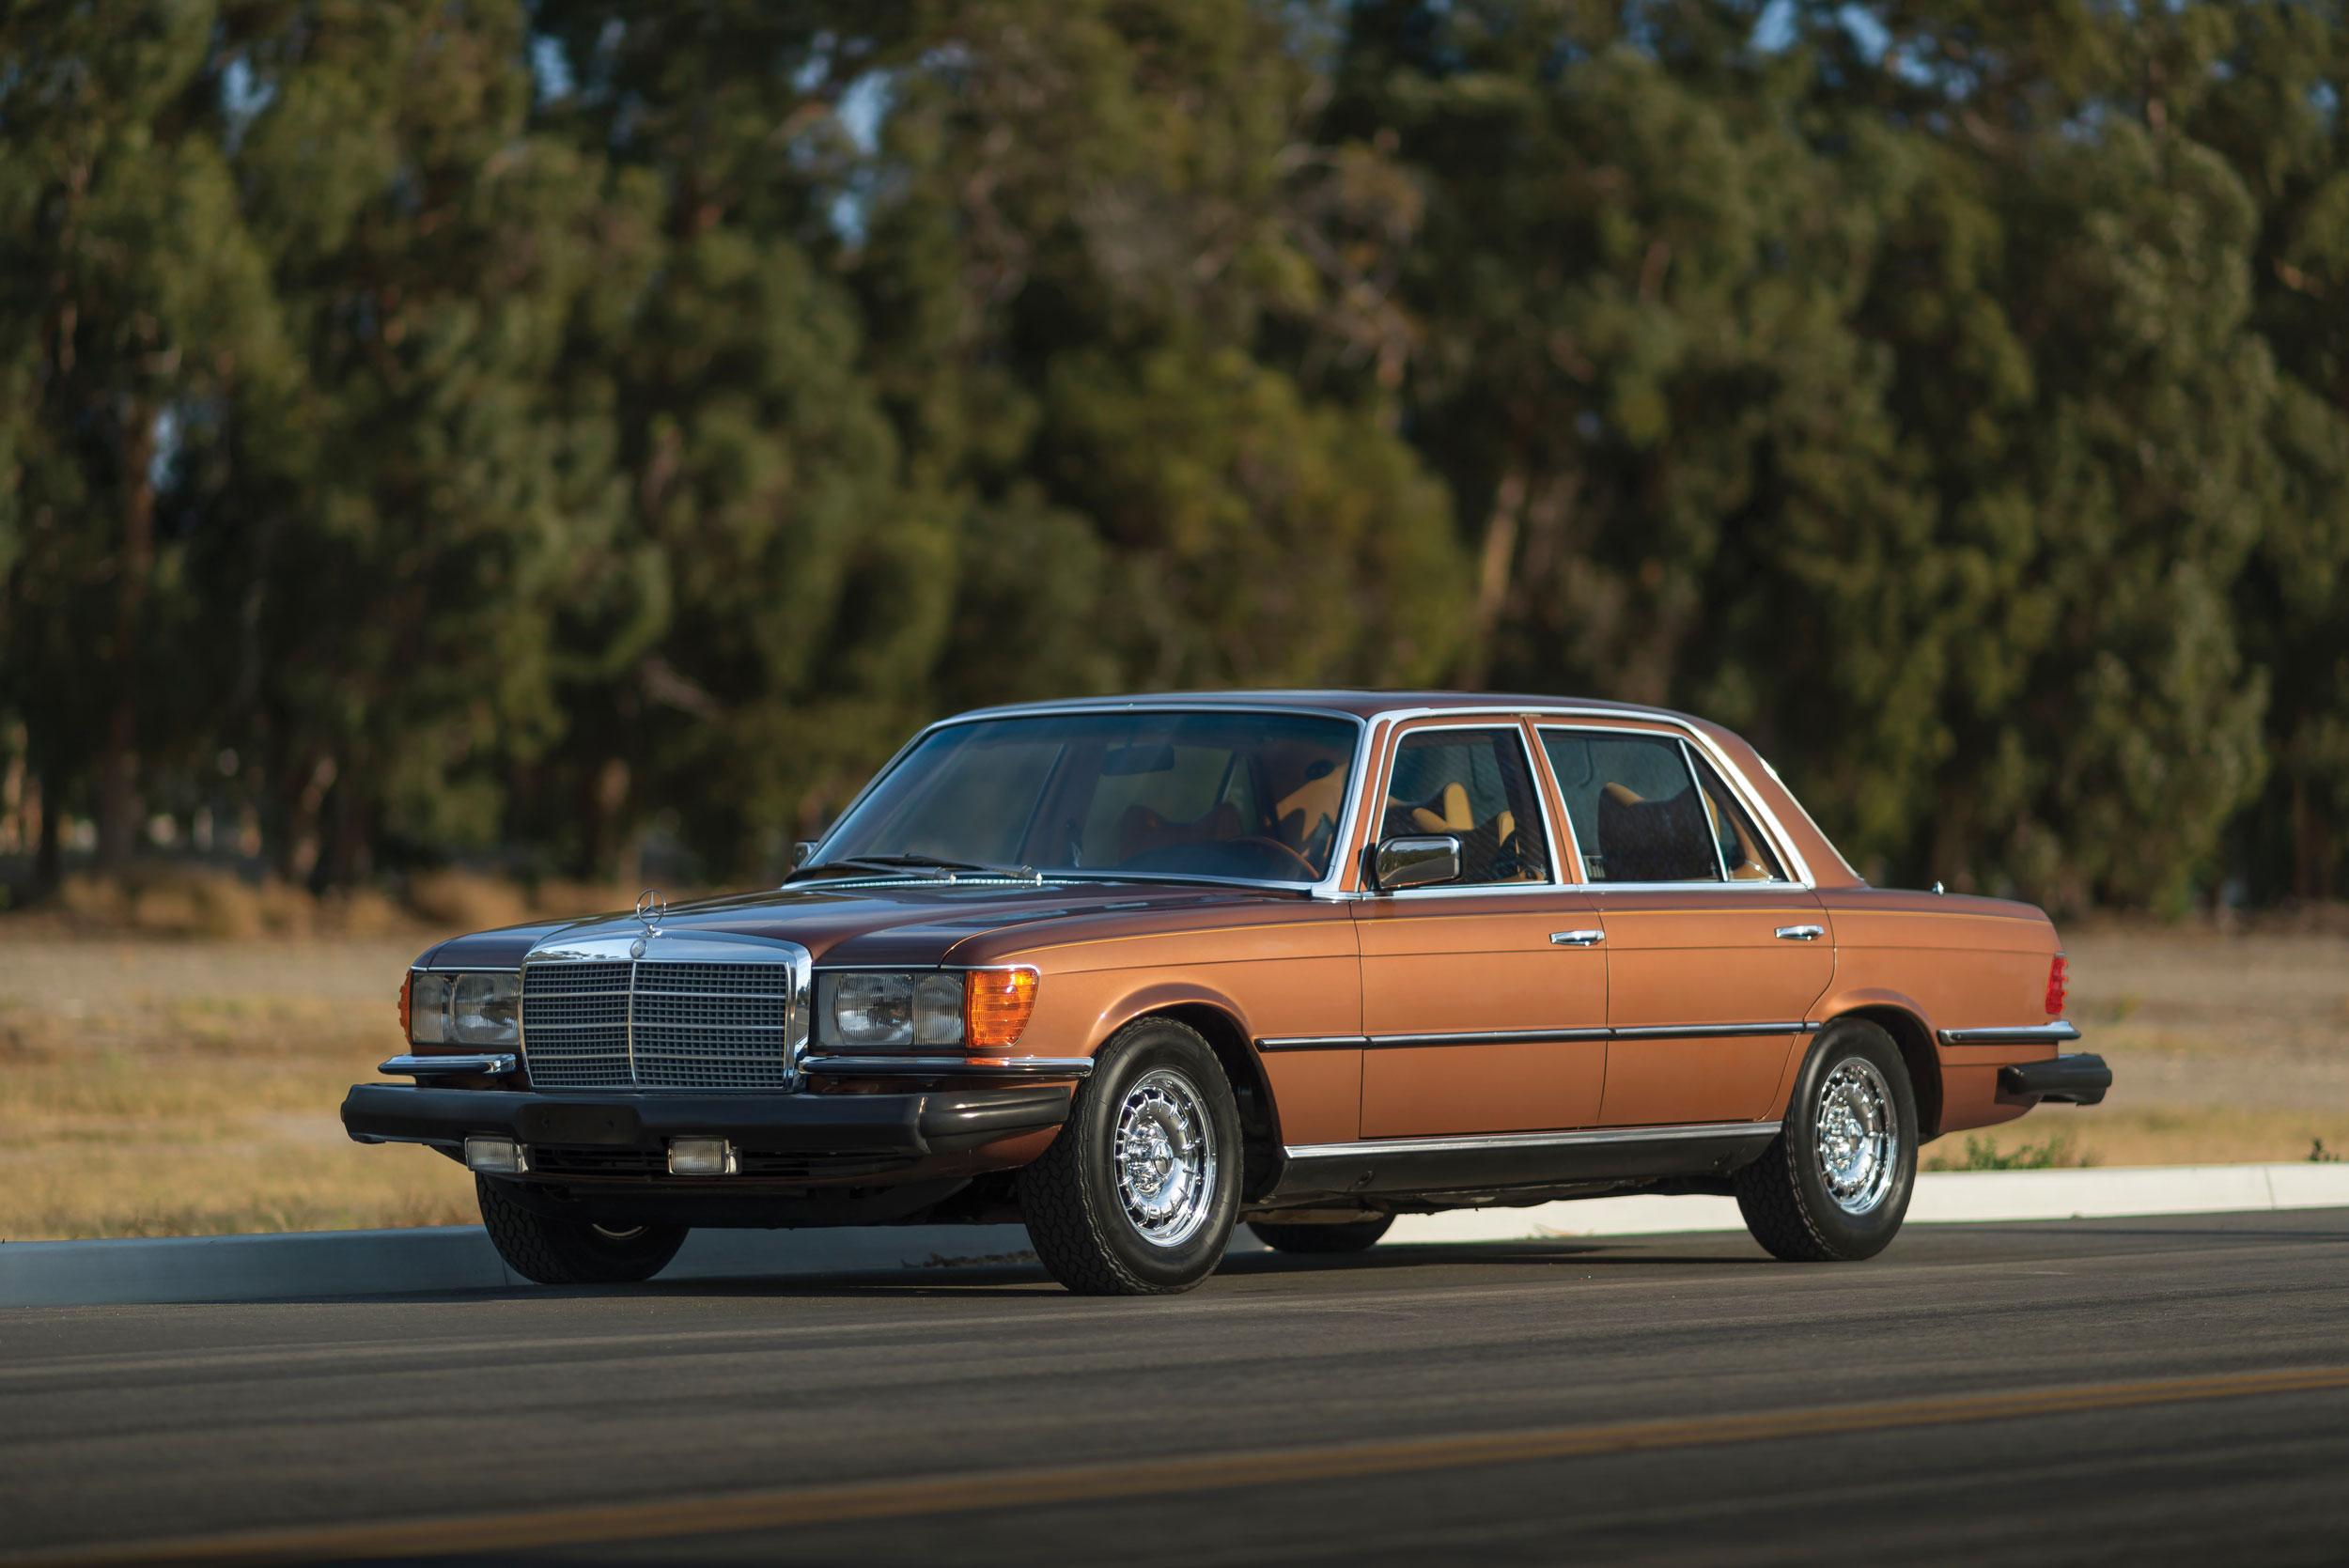 1979 Mercedes-Benz 450SEL 6.9 Sedan